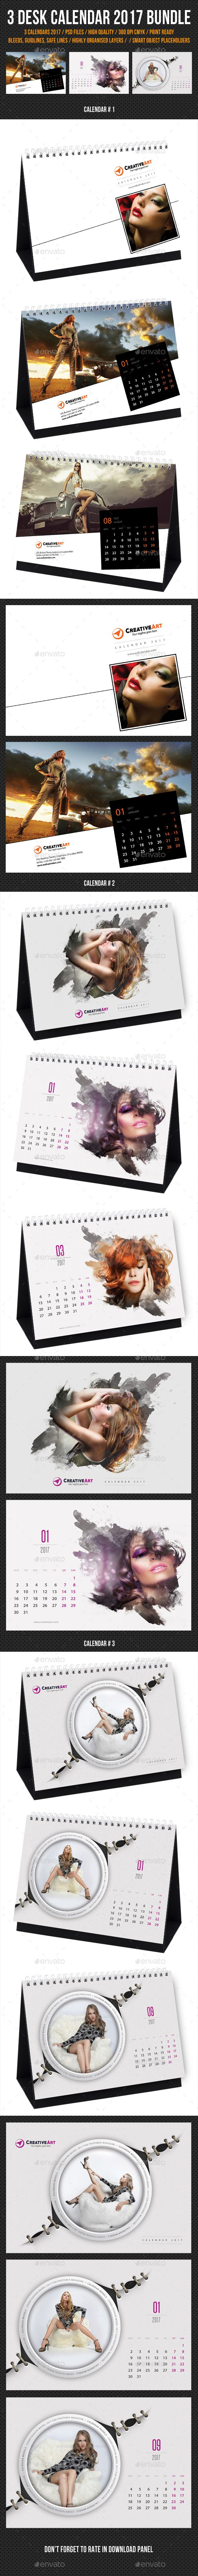 3 in 1 Creative Desk Calendar 2017 Templates PSD Bundle. Download here: https://graphicriver.net/item/3-in-1-creative-desk-calendar-2017-bundle-05/16995423?ref=ksioks